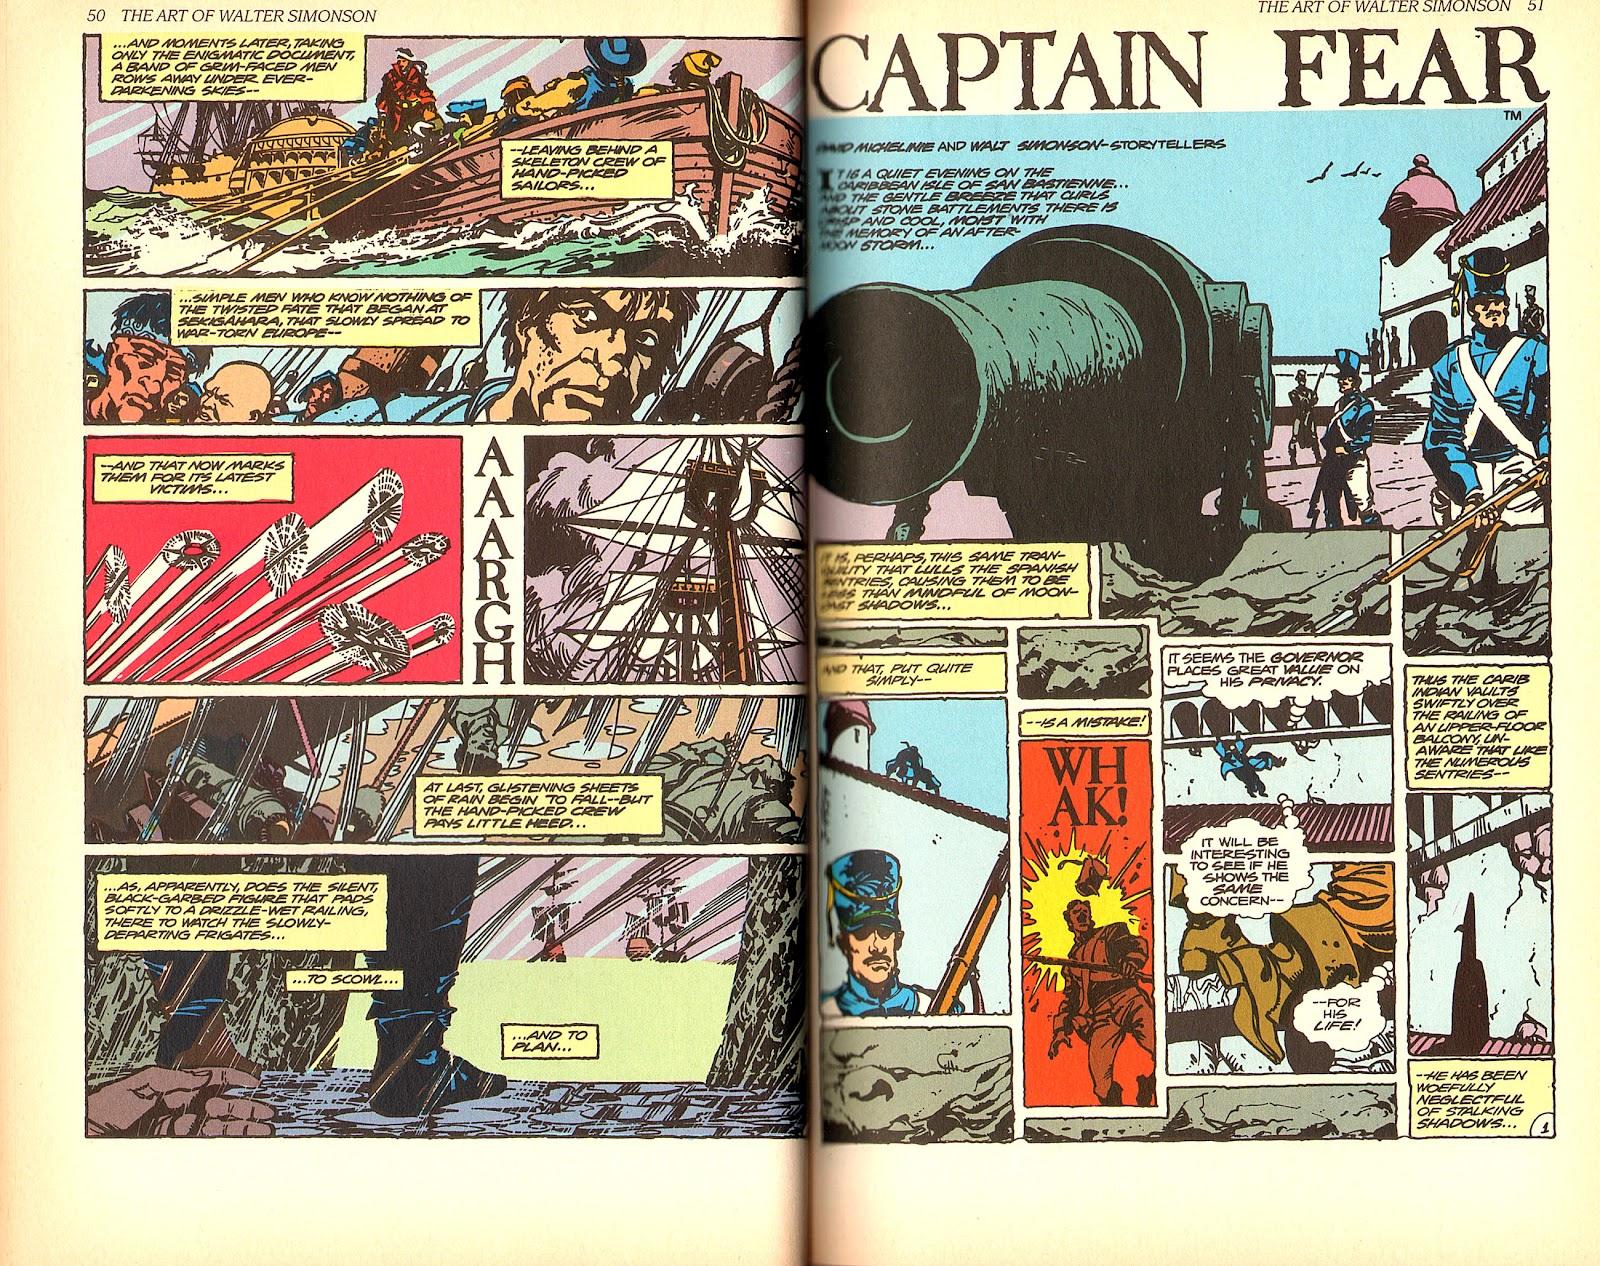 Read online The Art of Walter Simonson comic -  Issue # TPB - 27